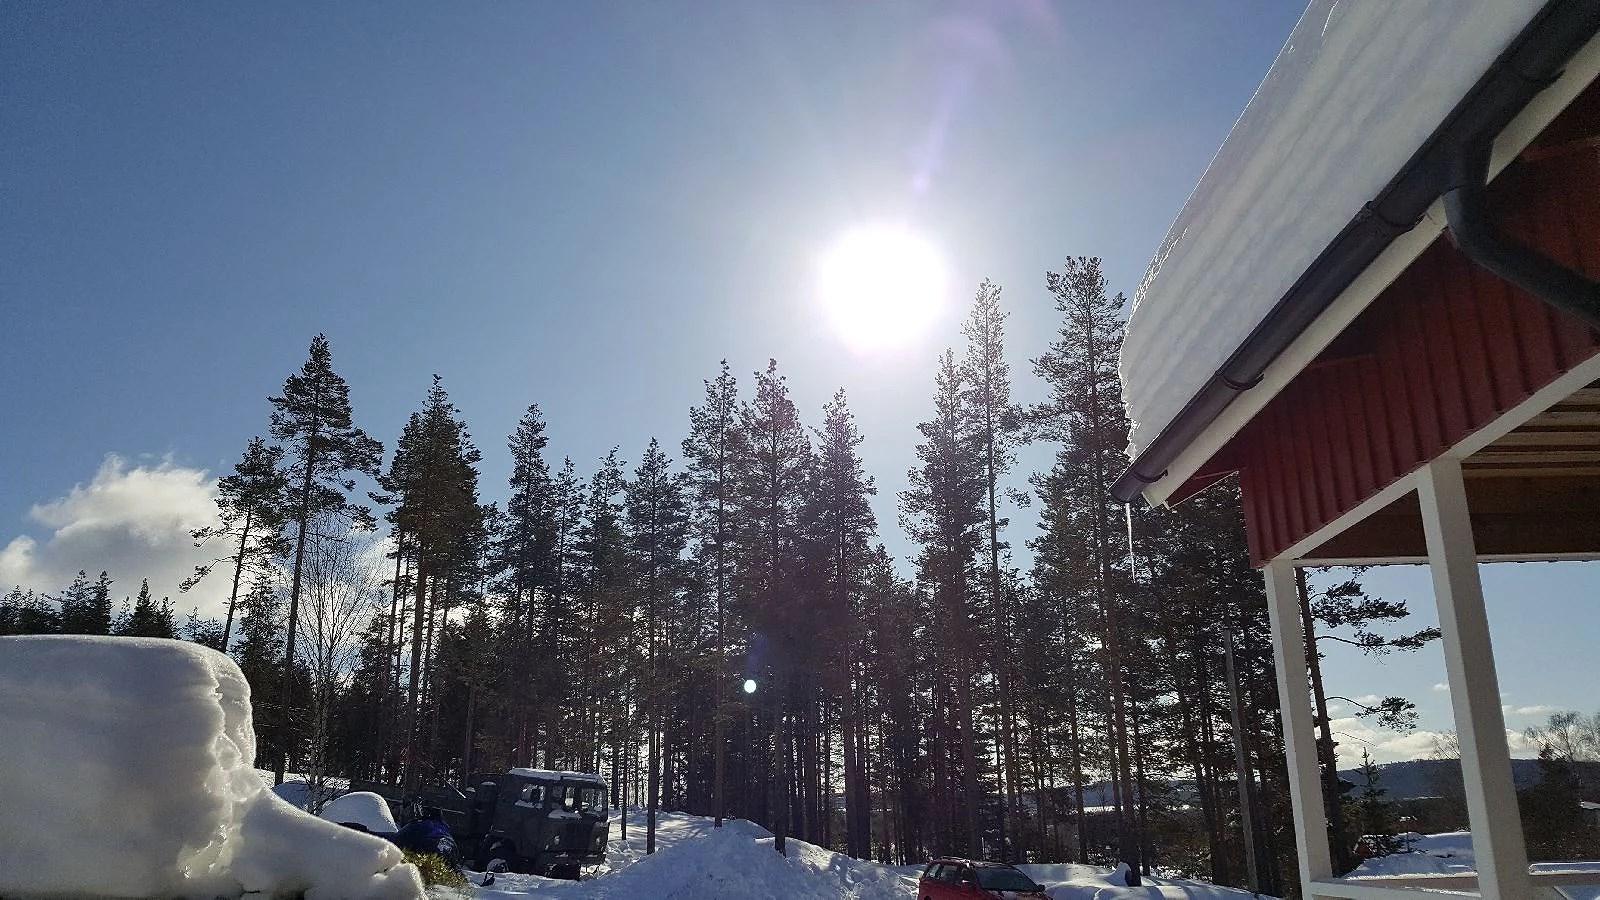 Loving the sun